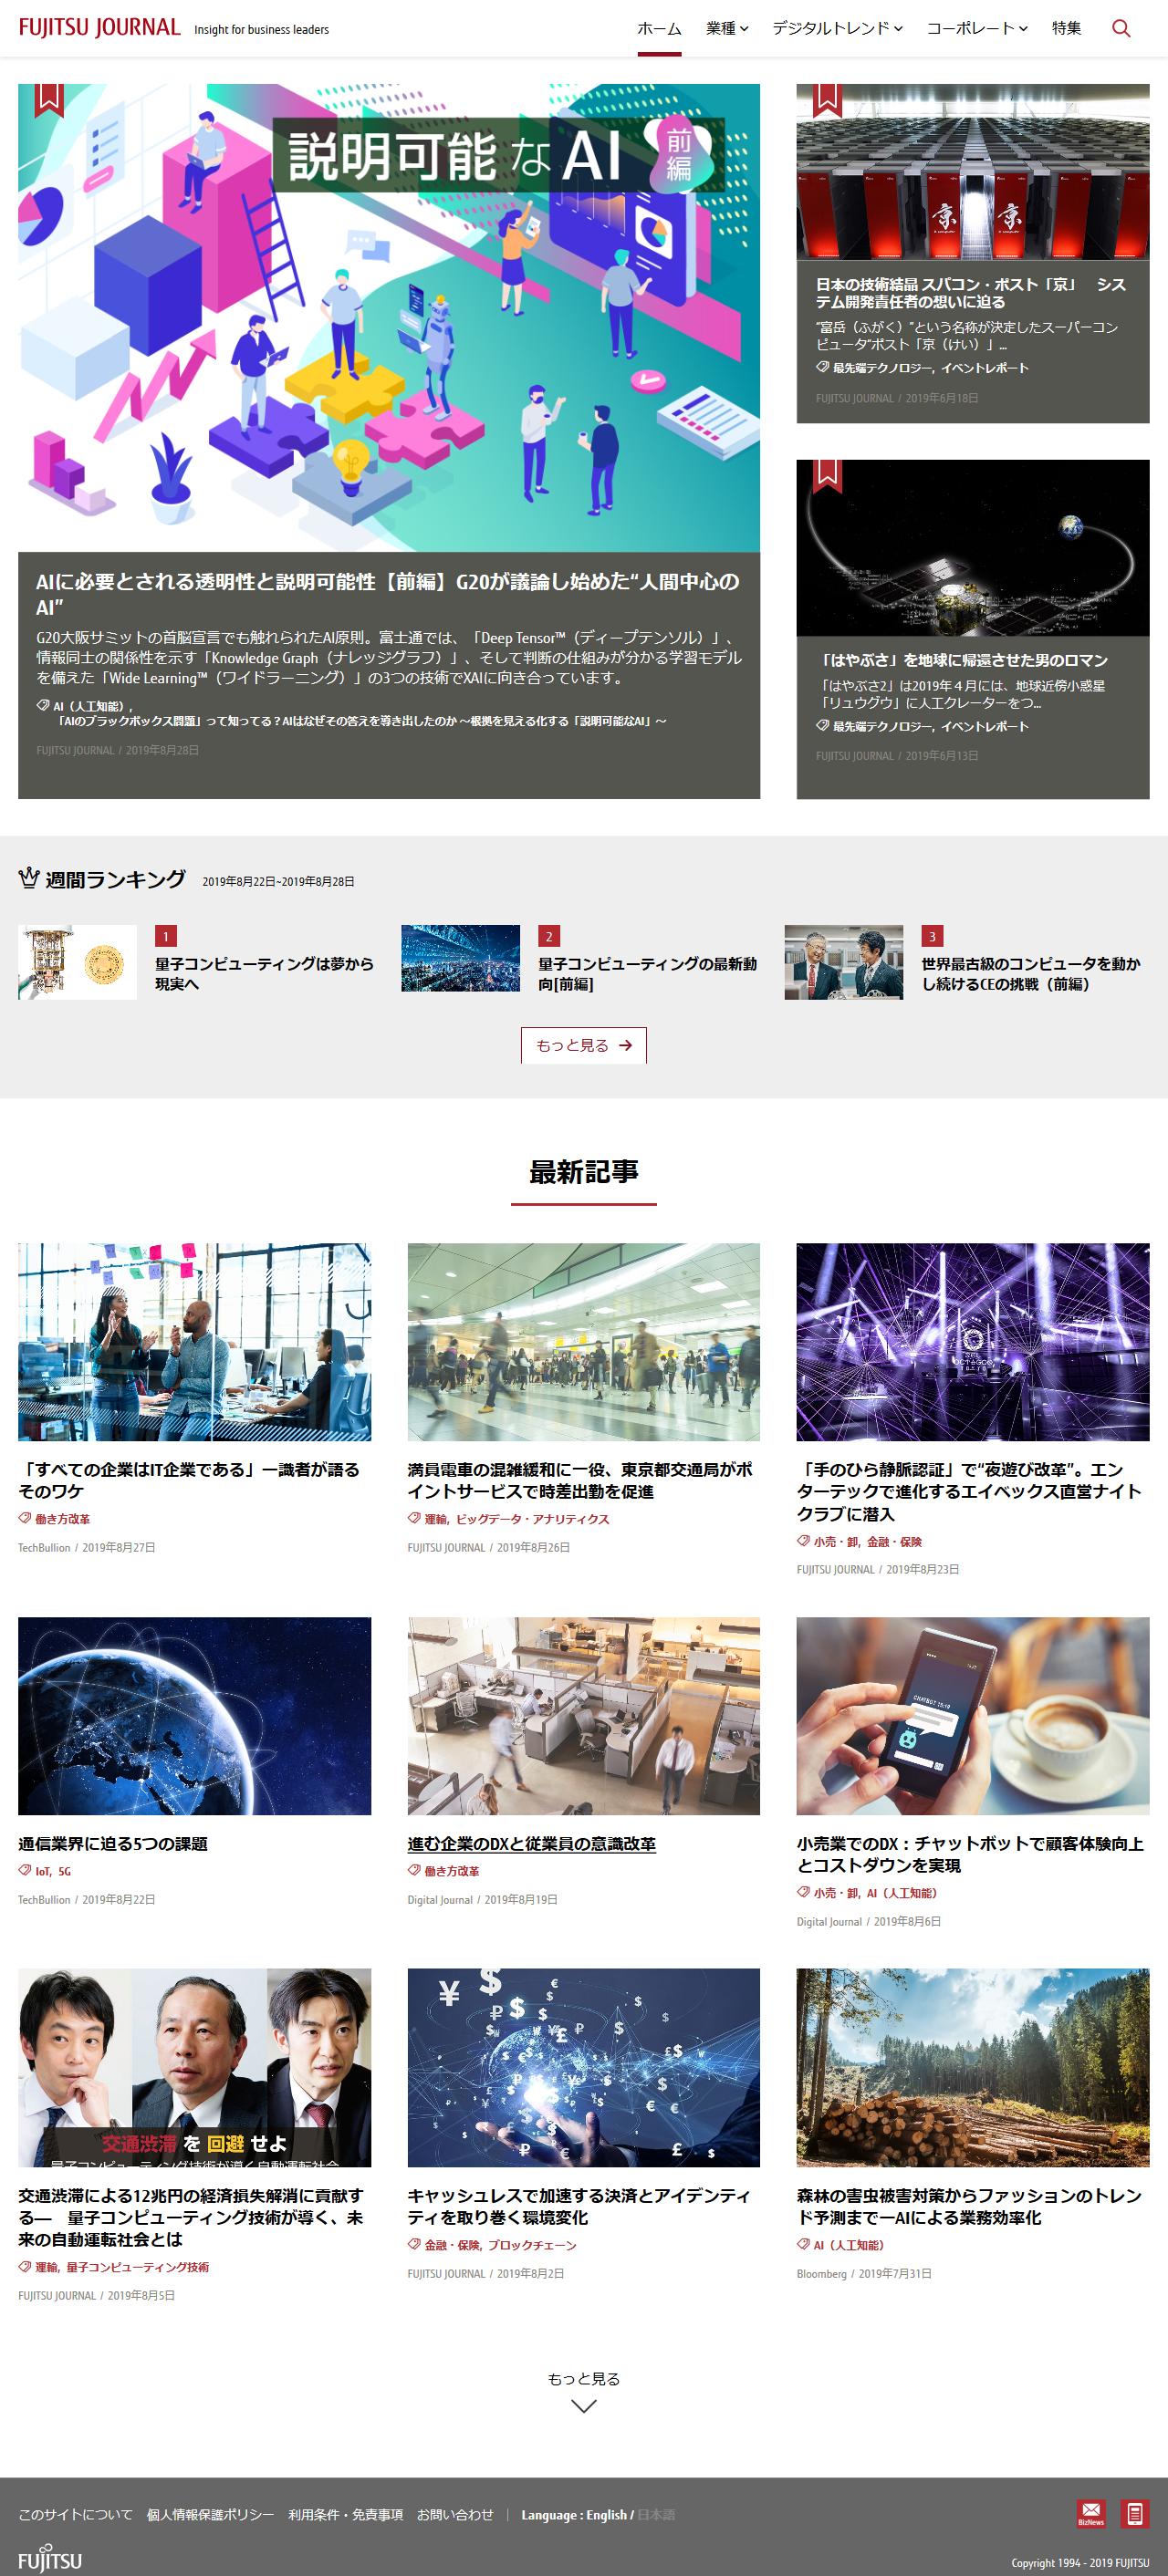 FireShot Capture 001 - FUJITSU JOURNAL(富士通ジャーナル) - blog.global.fujitsu.com.png